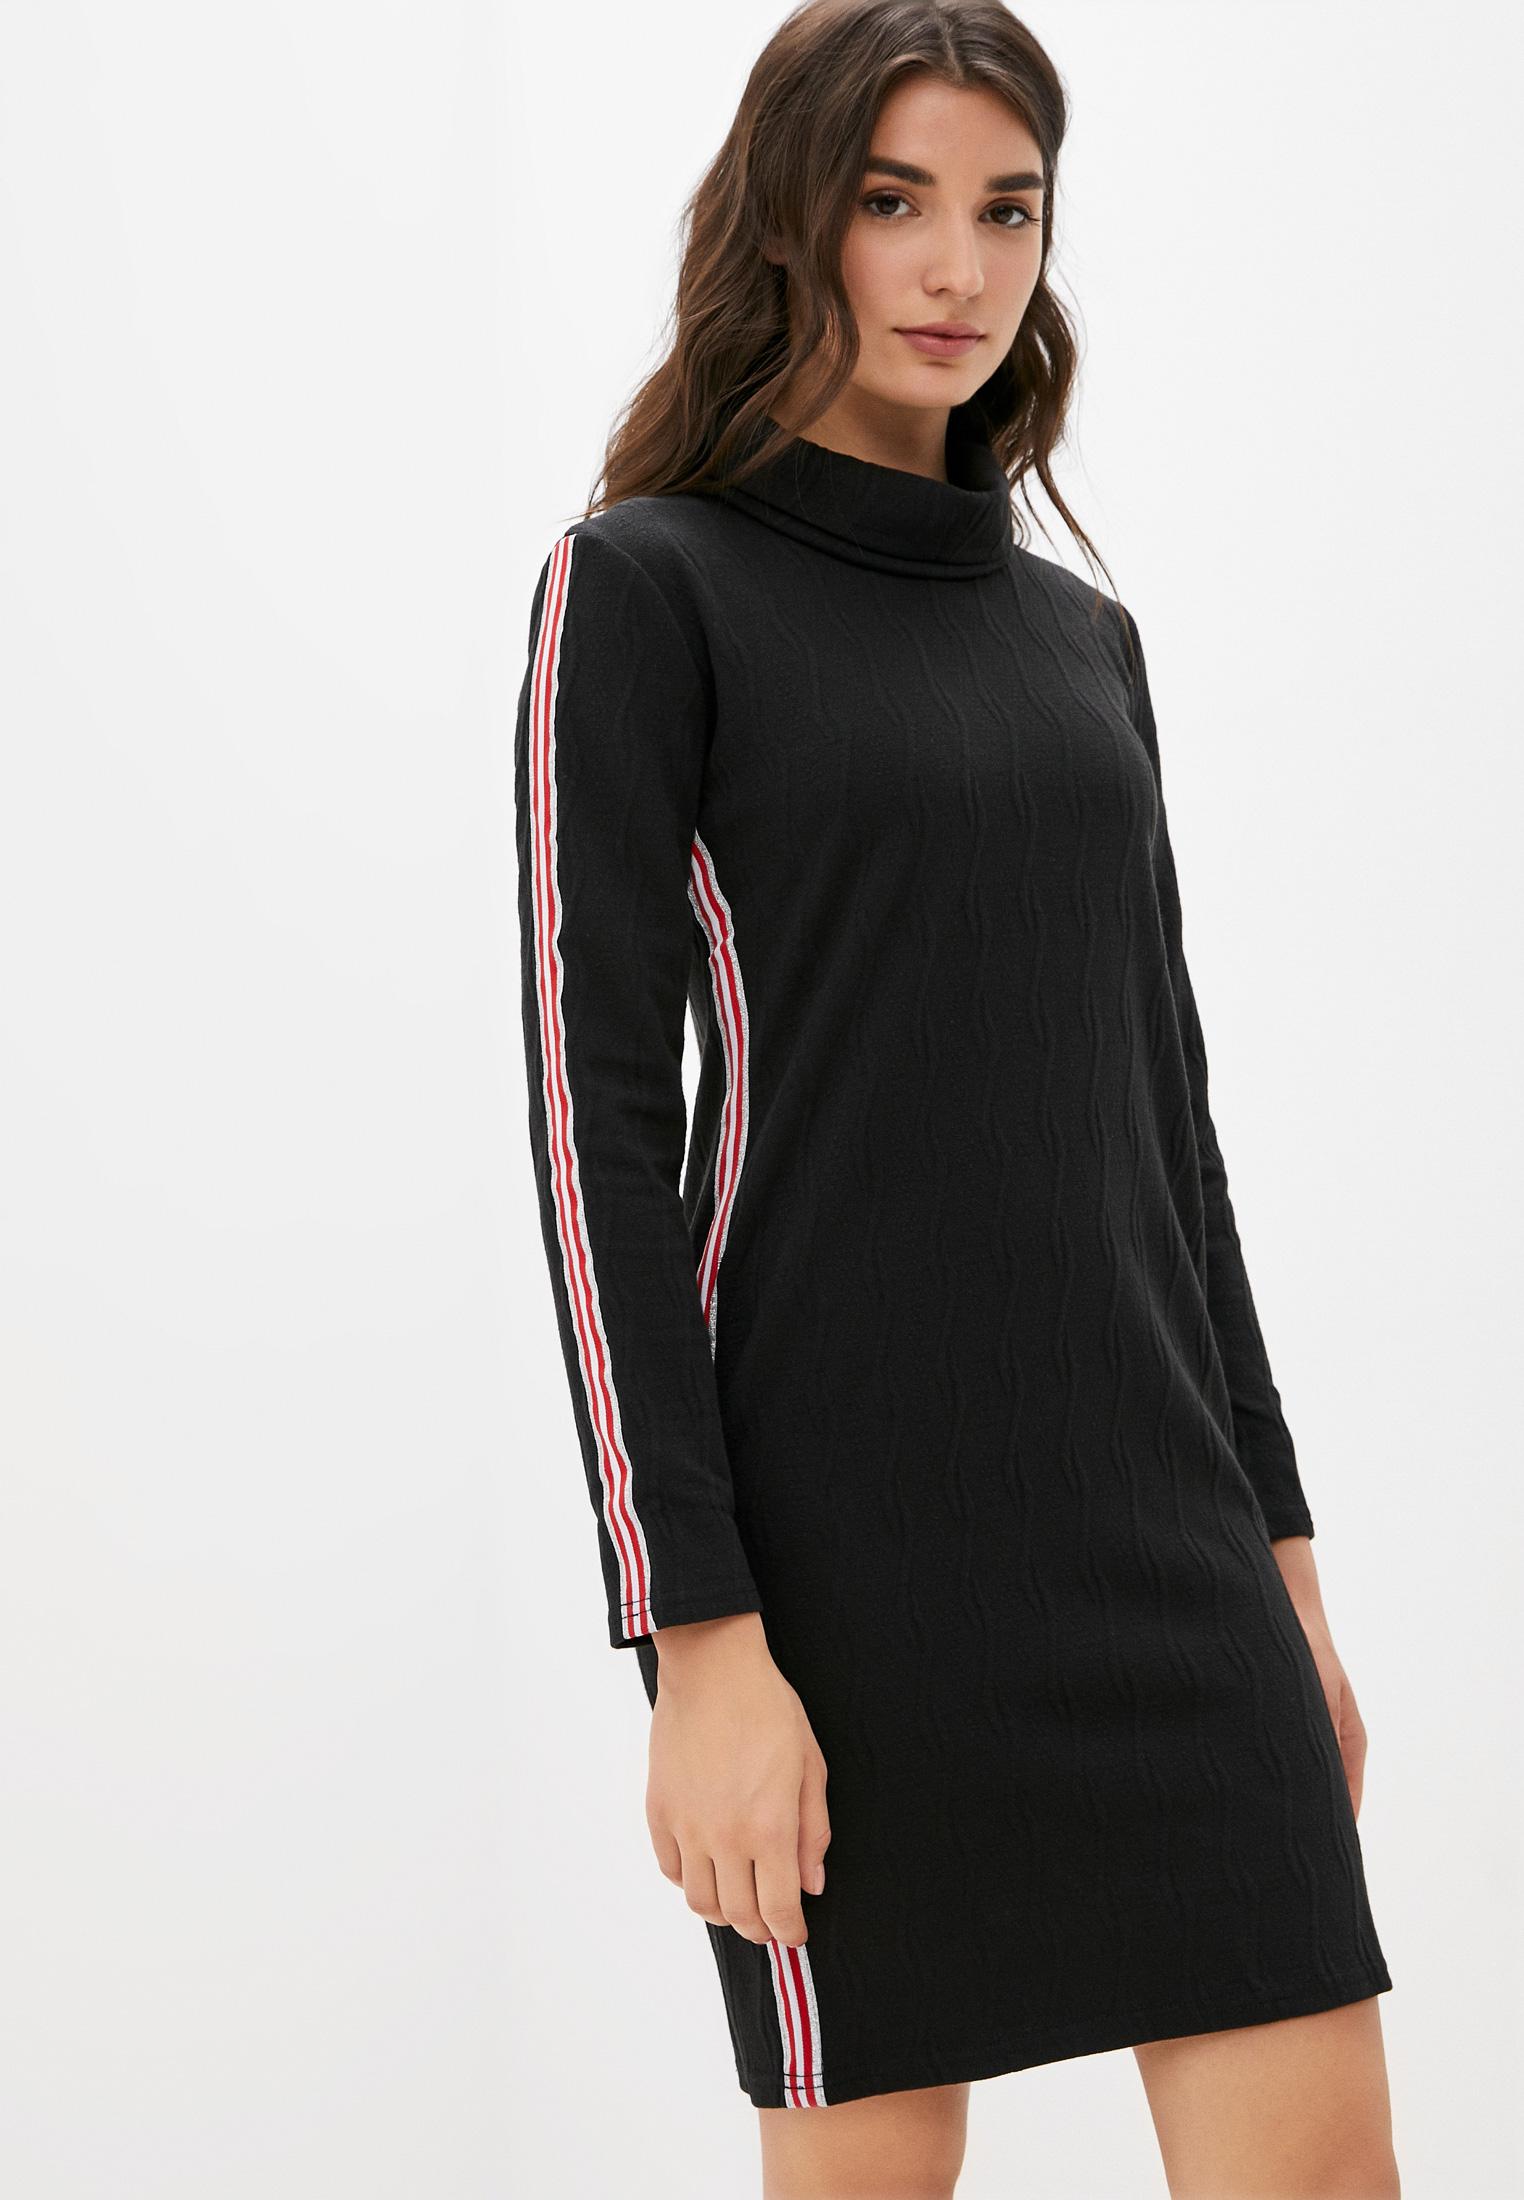 Вязаное платье Pink Orange PO21-0313-2351-3